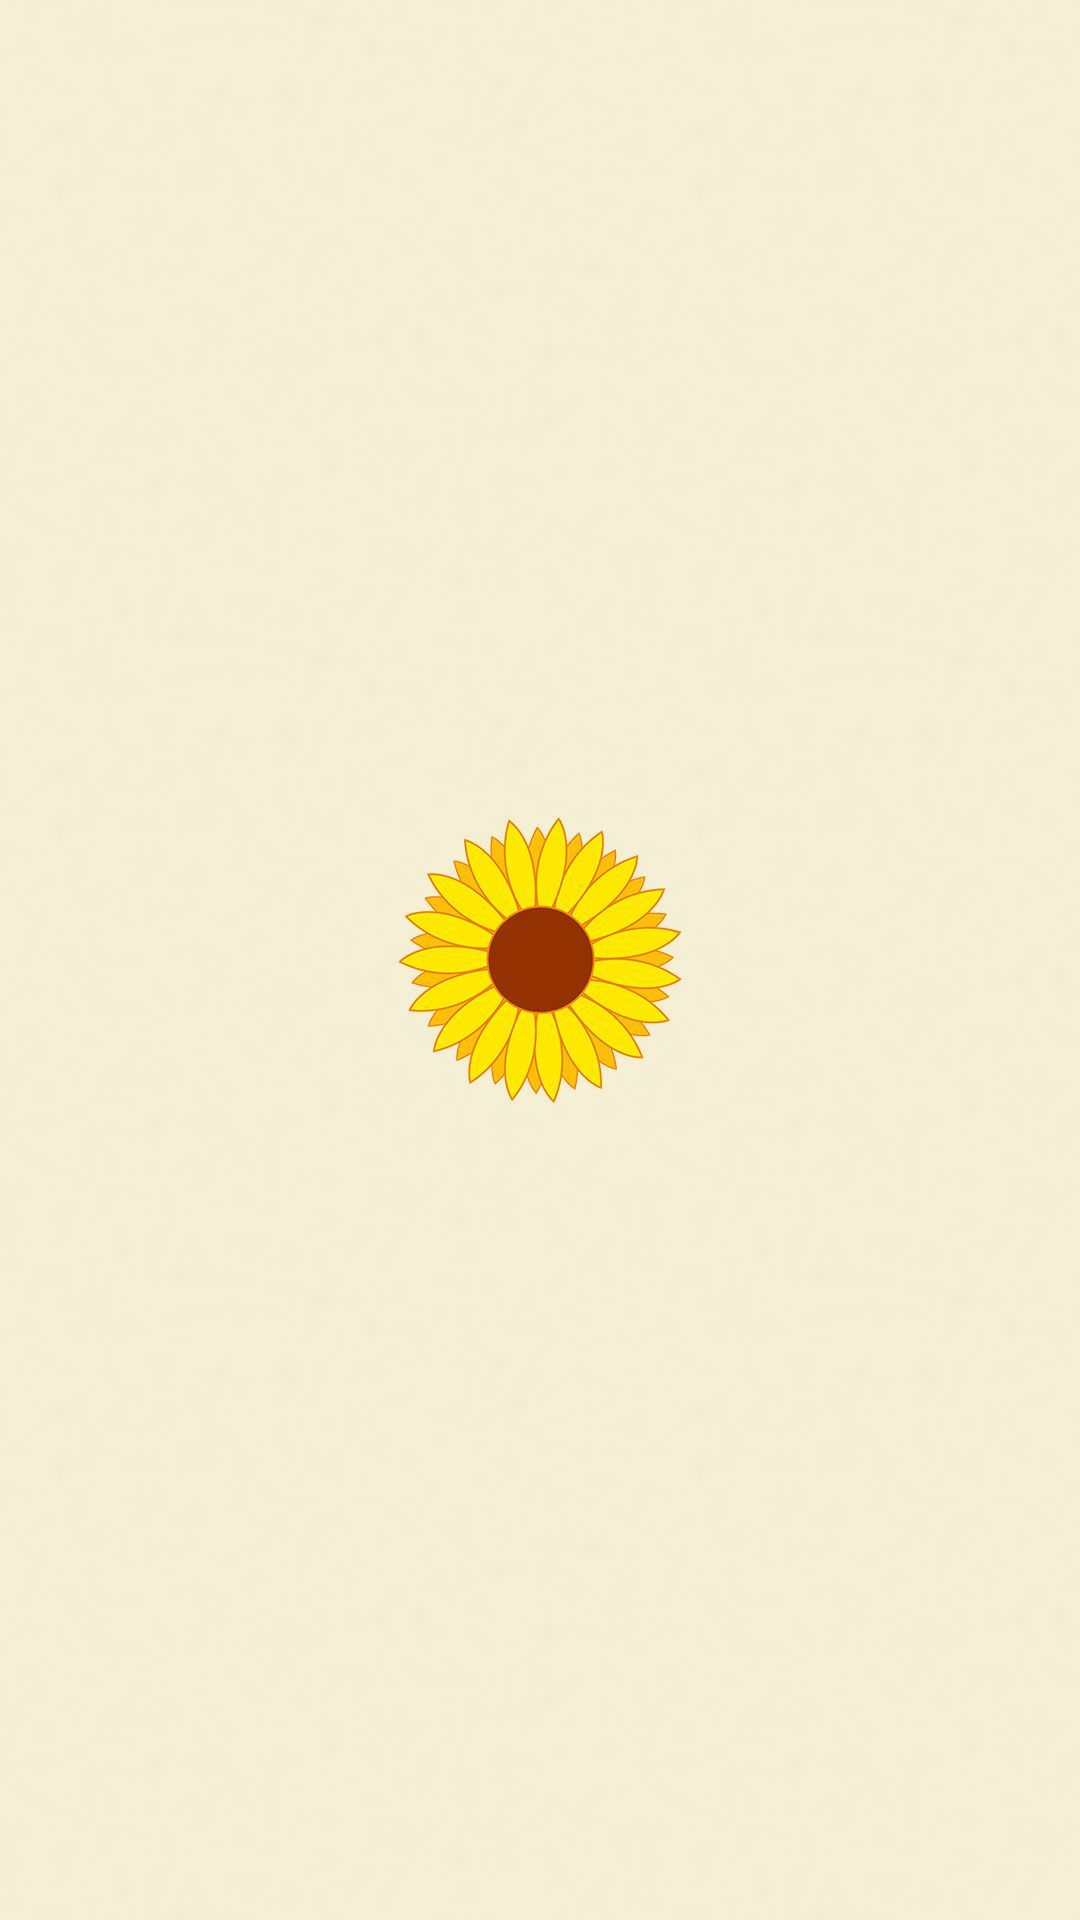 Sunflower Minimalist Wallpapers - Top Free Sunflower ...